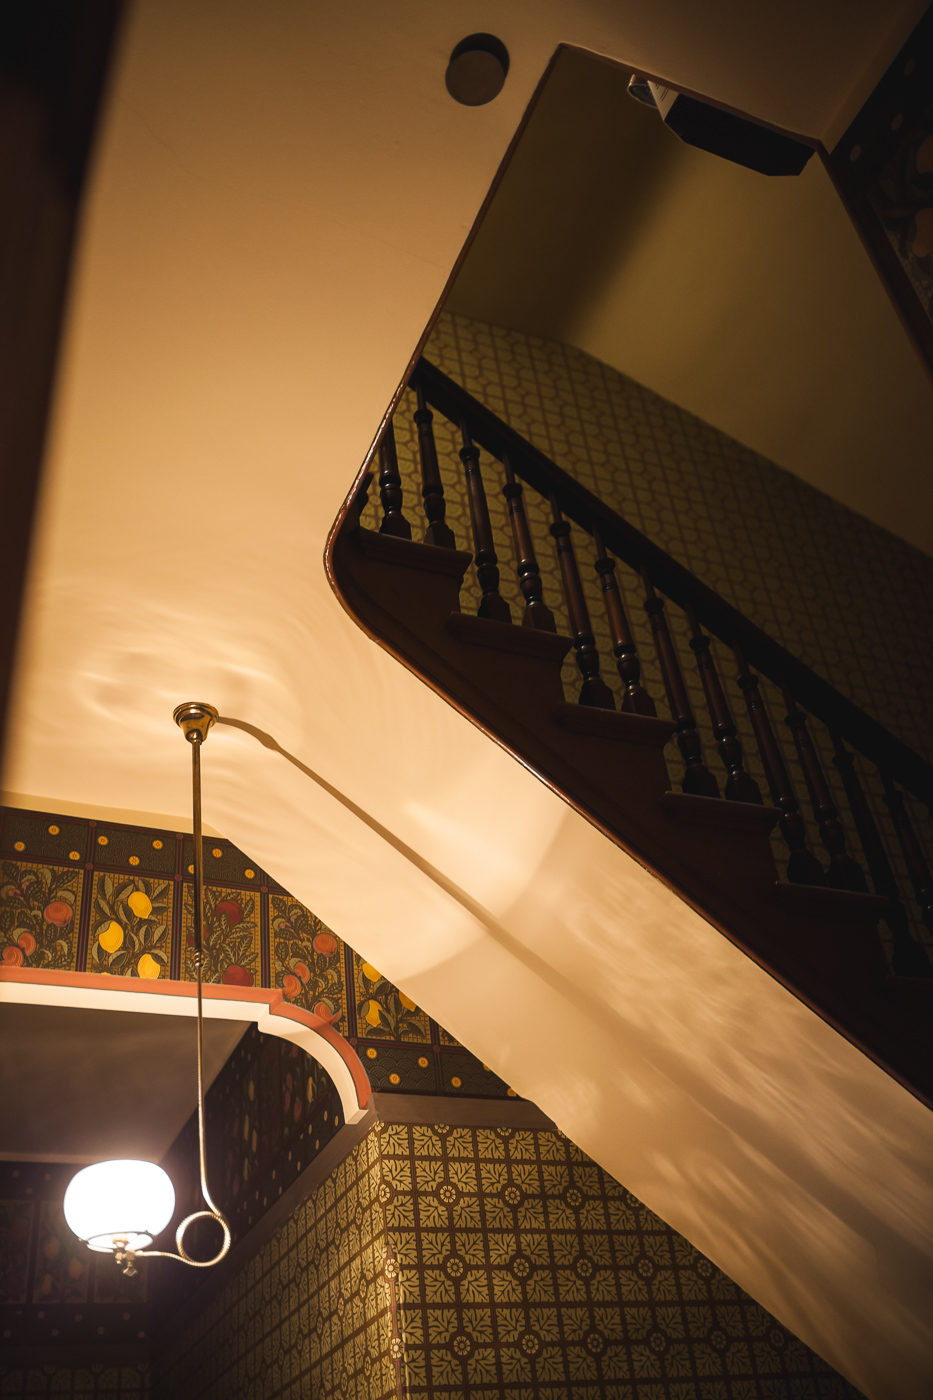 mchenry mansion interior